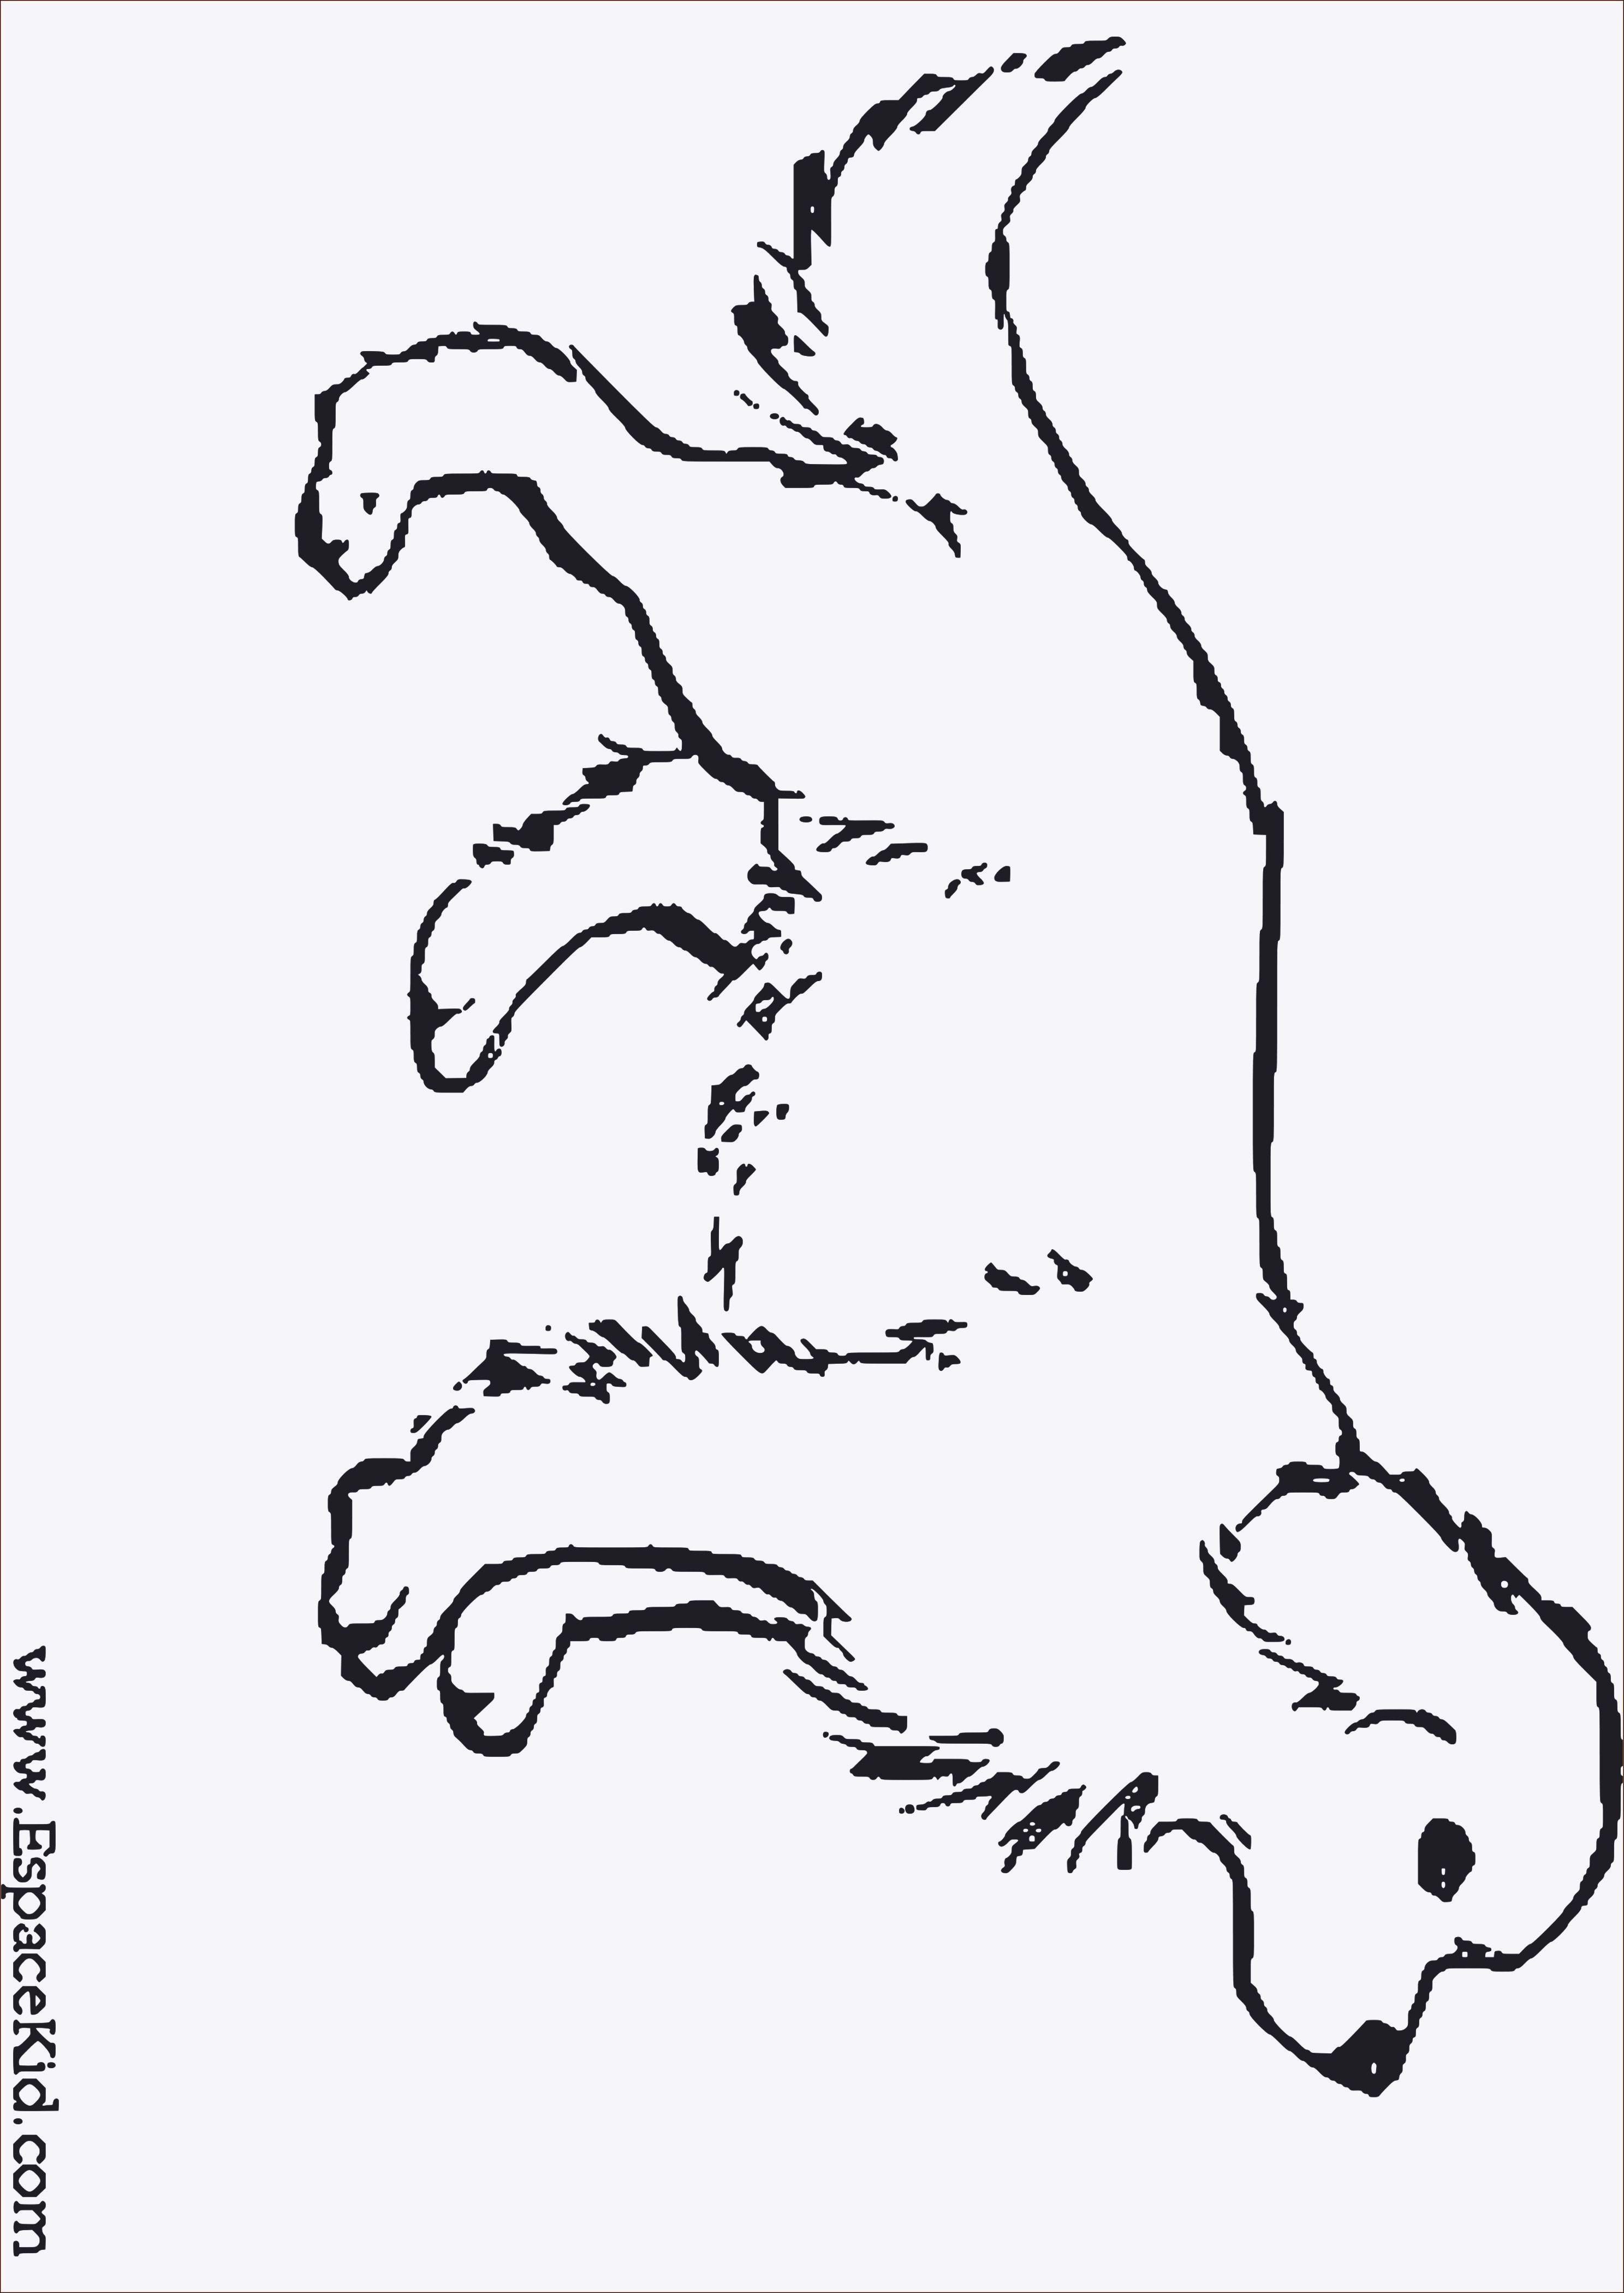 Ausmalbild Lightning Mcqueen Inspirierend Ausmalbilder Zum Ausdrucken Lightning Mcqueen 14 Coloring Page Stock